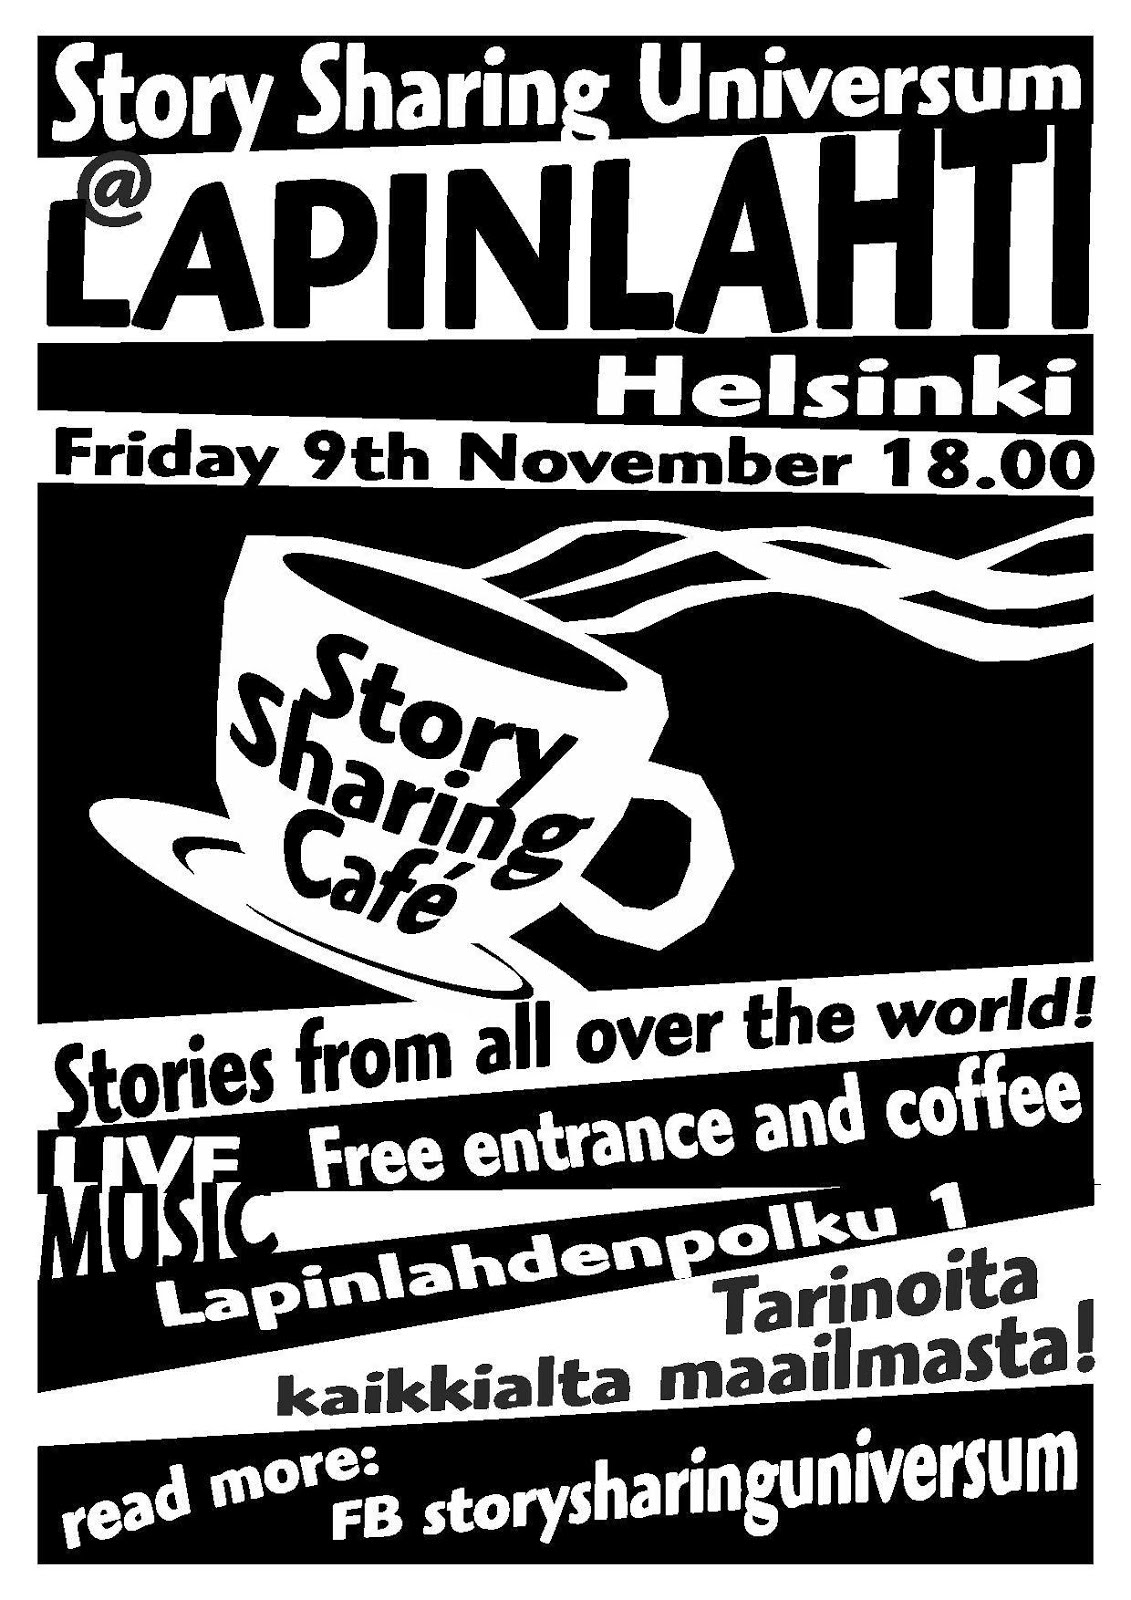 Story Sharing Café at Lapinlahti